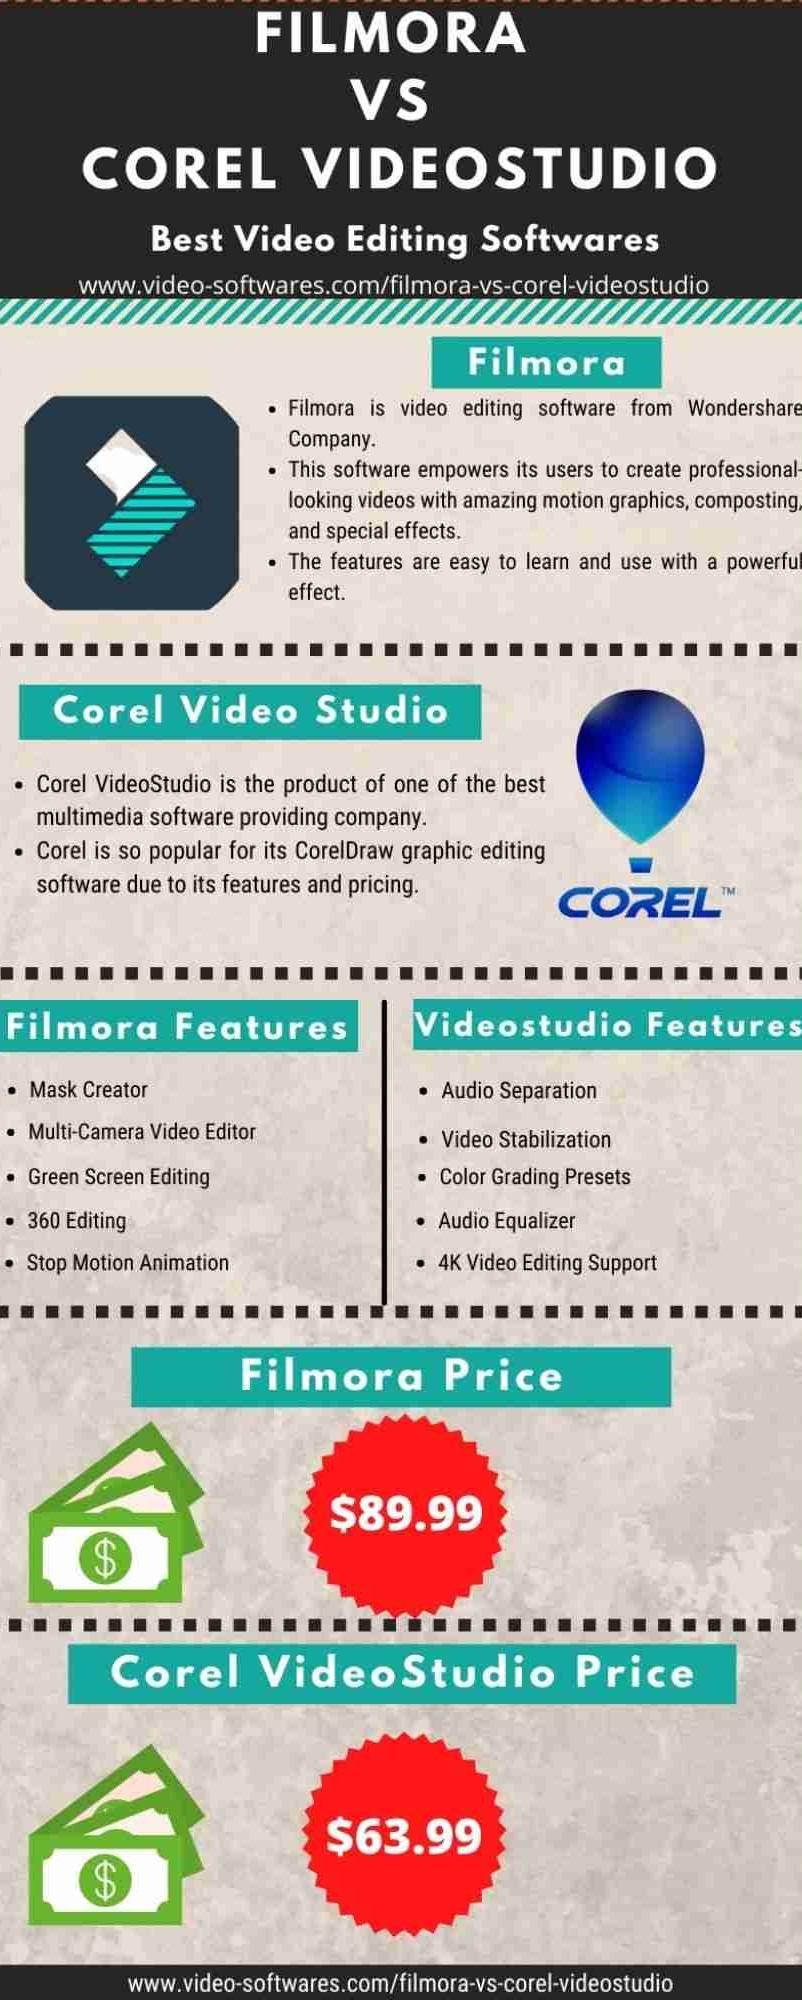 Filmora Vs Corel Videostudio